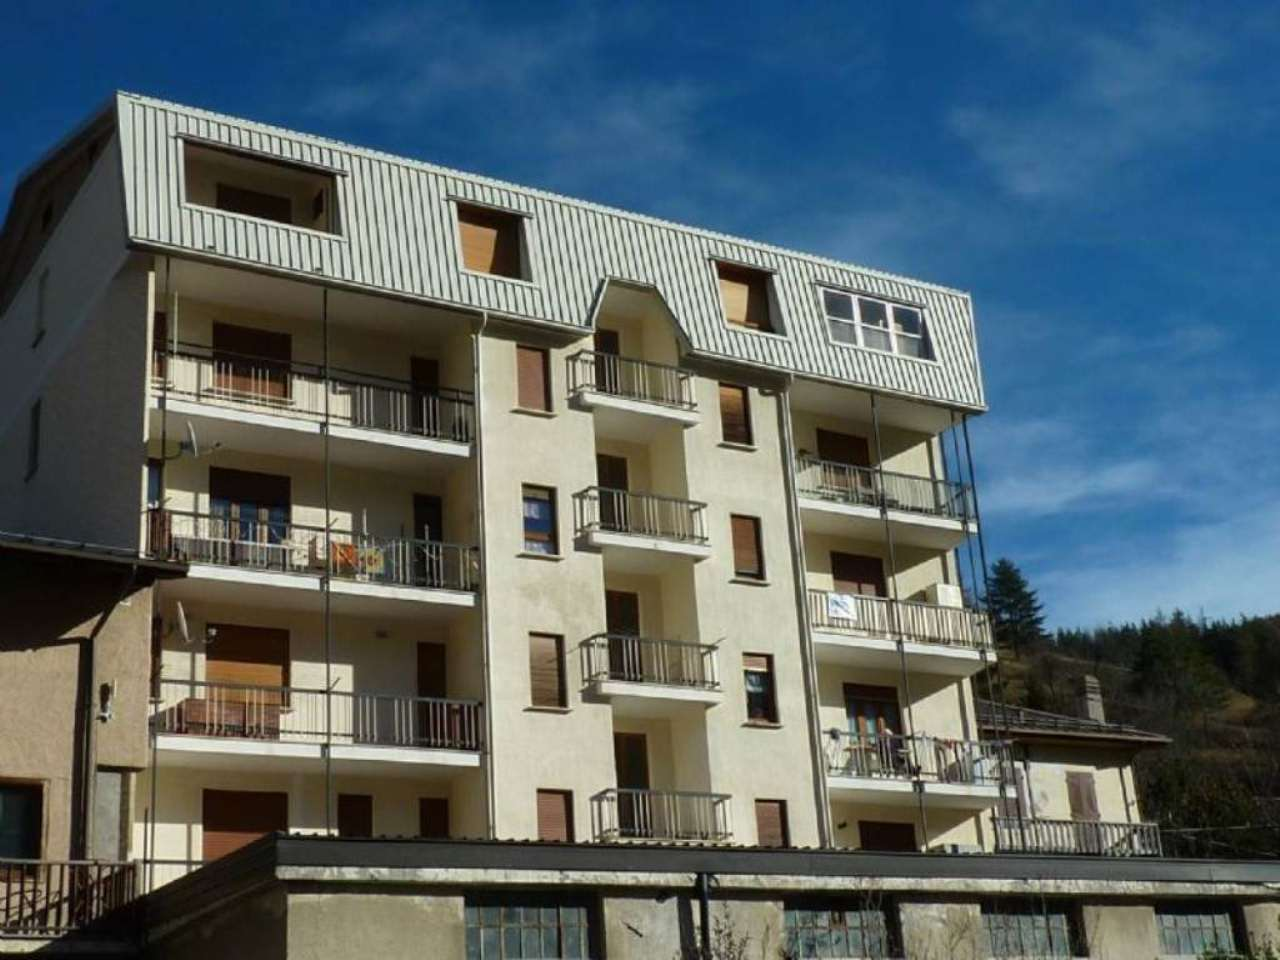 Bilocale Cesana Torinese Via Via Pinerolo 1